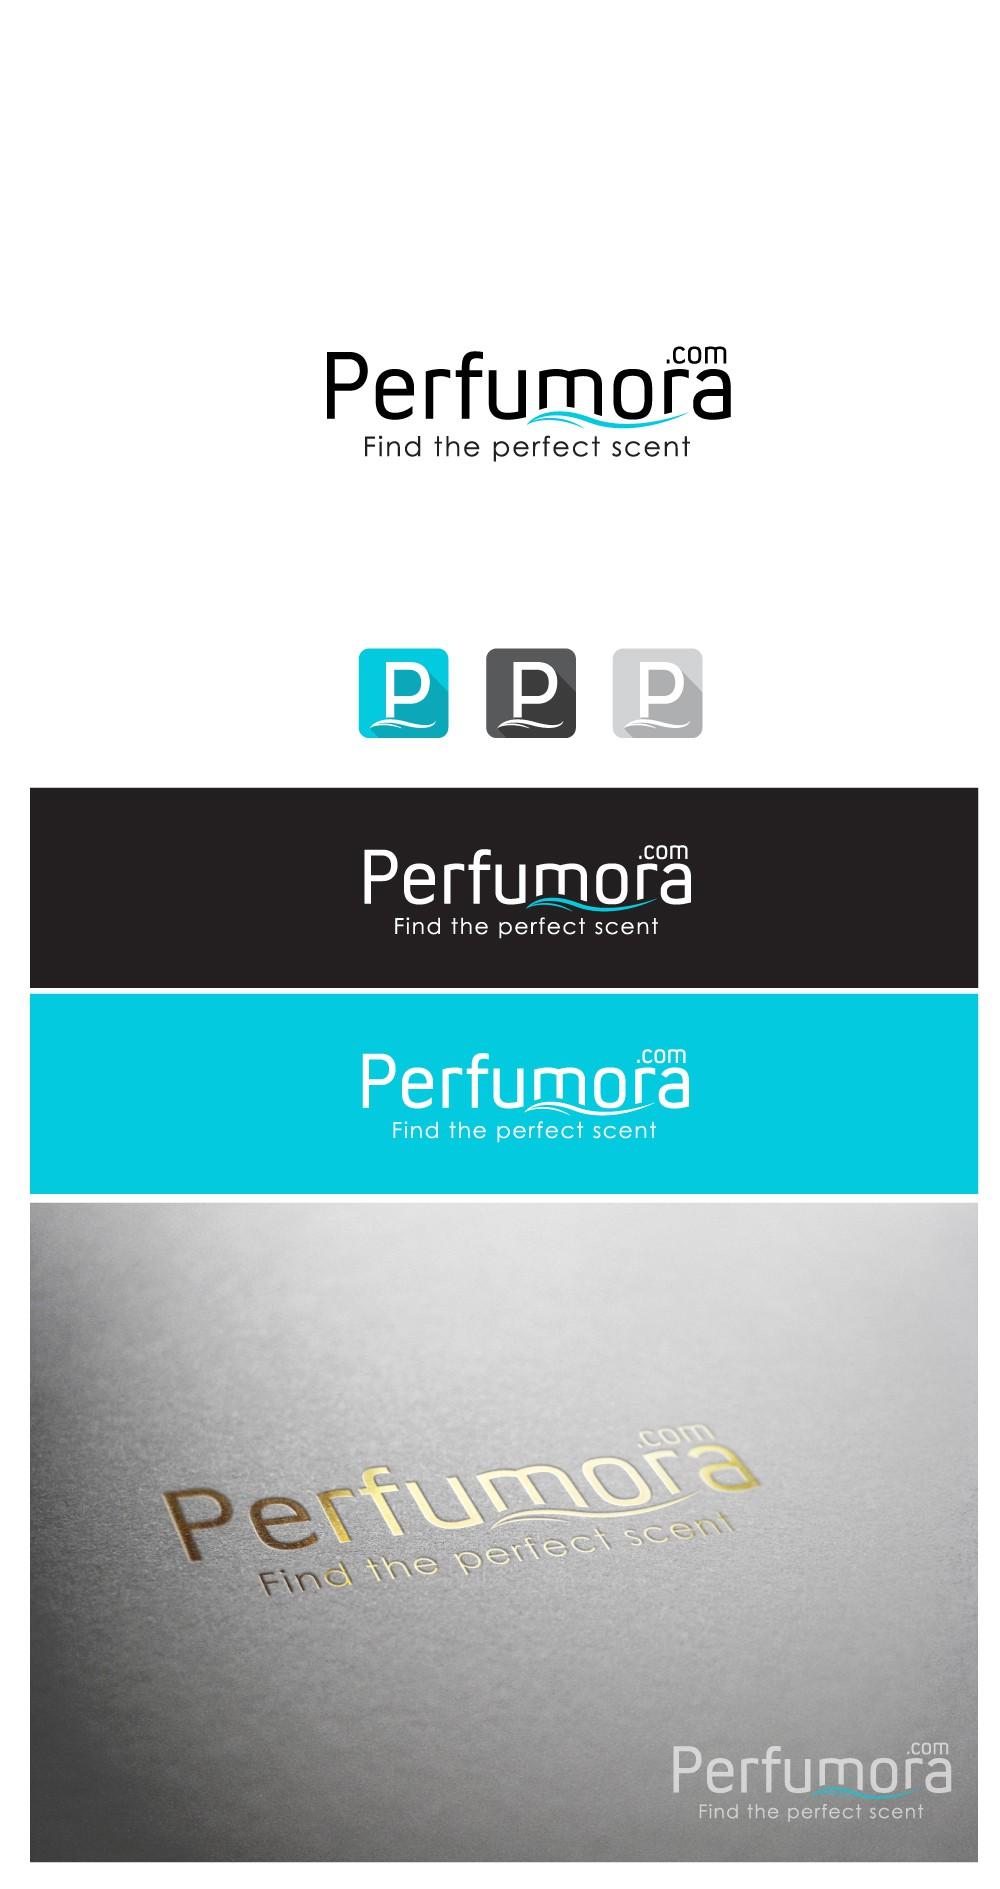 Perfumora.com // New online perfume store needs a logo!